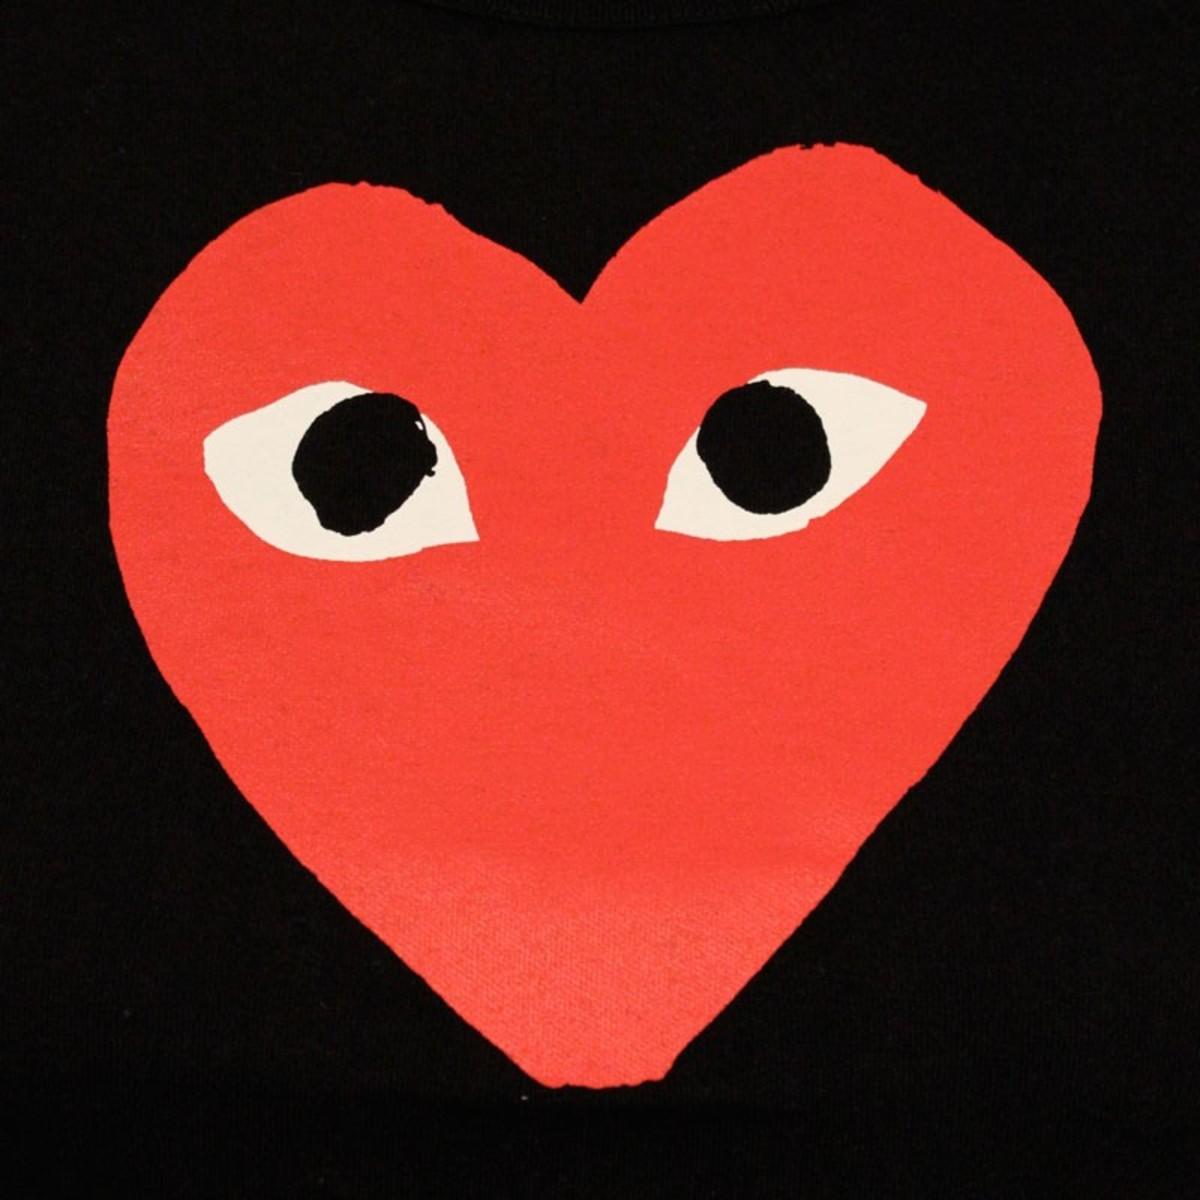 comme-des-garcons-red-heart-black-3